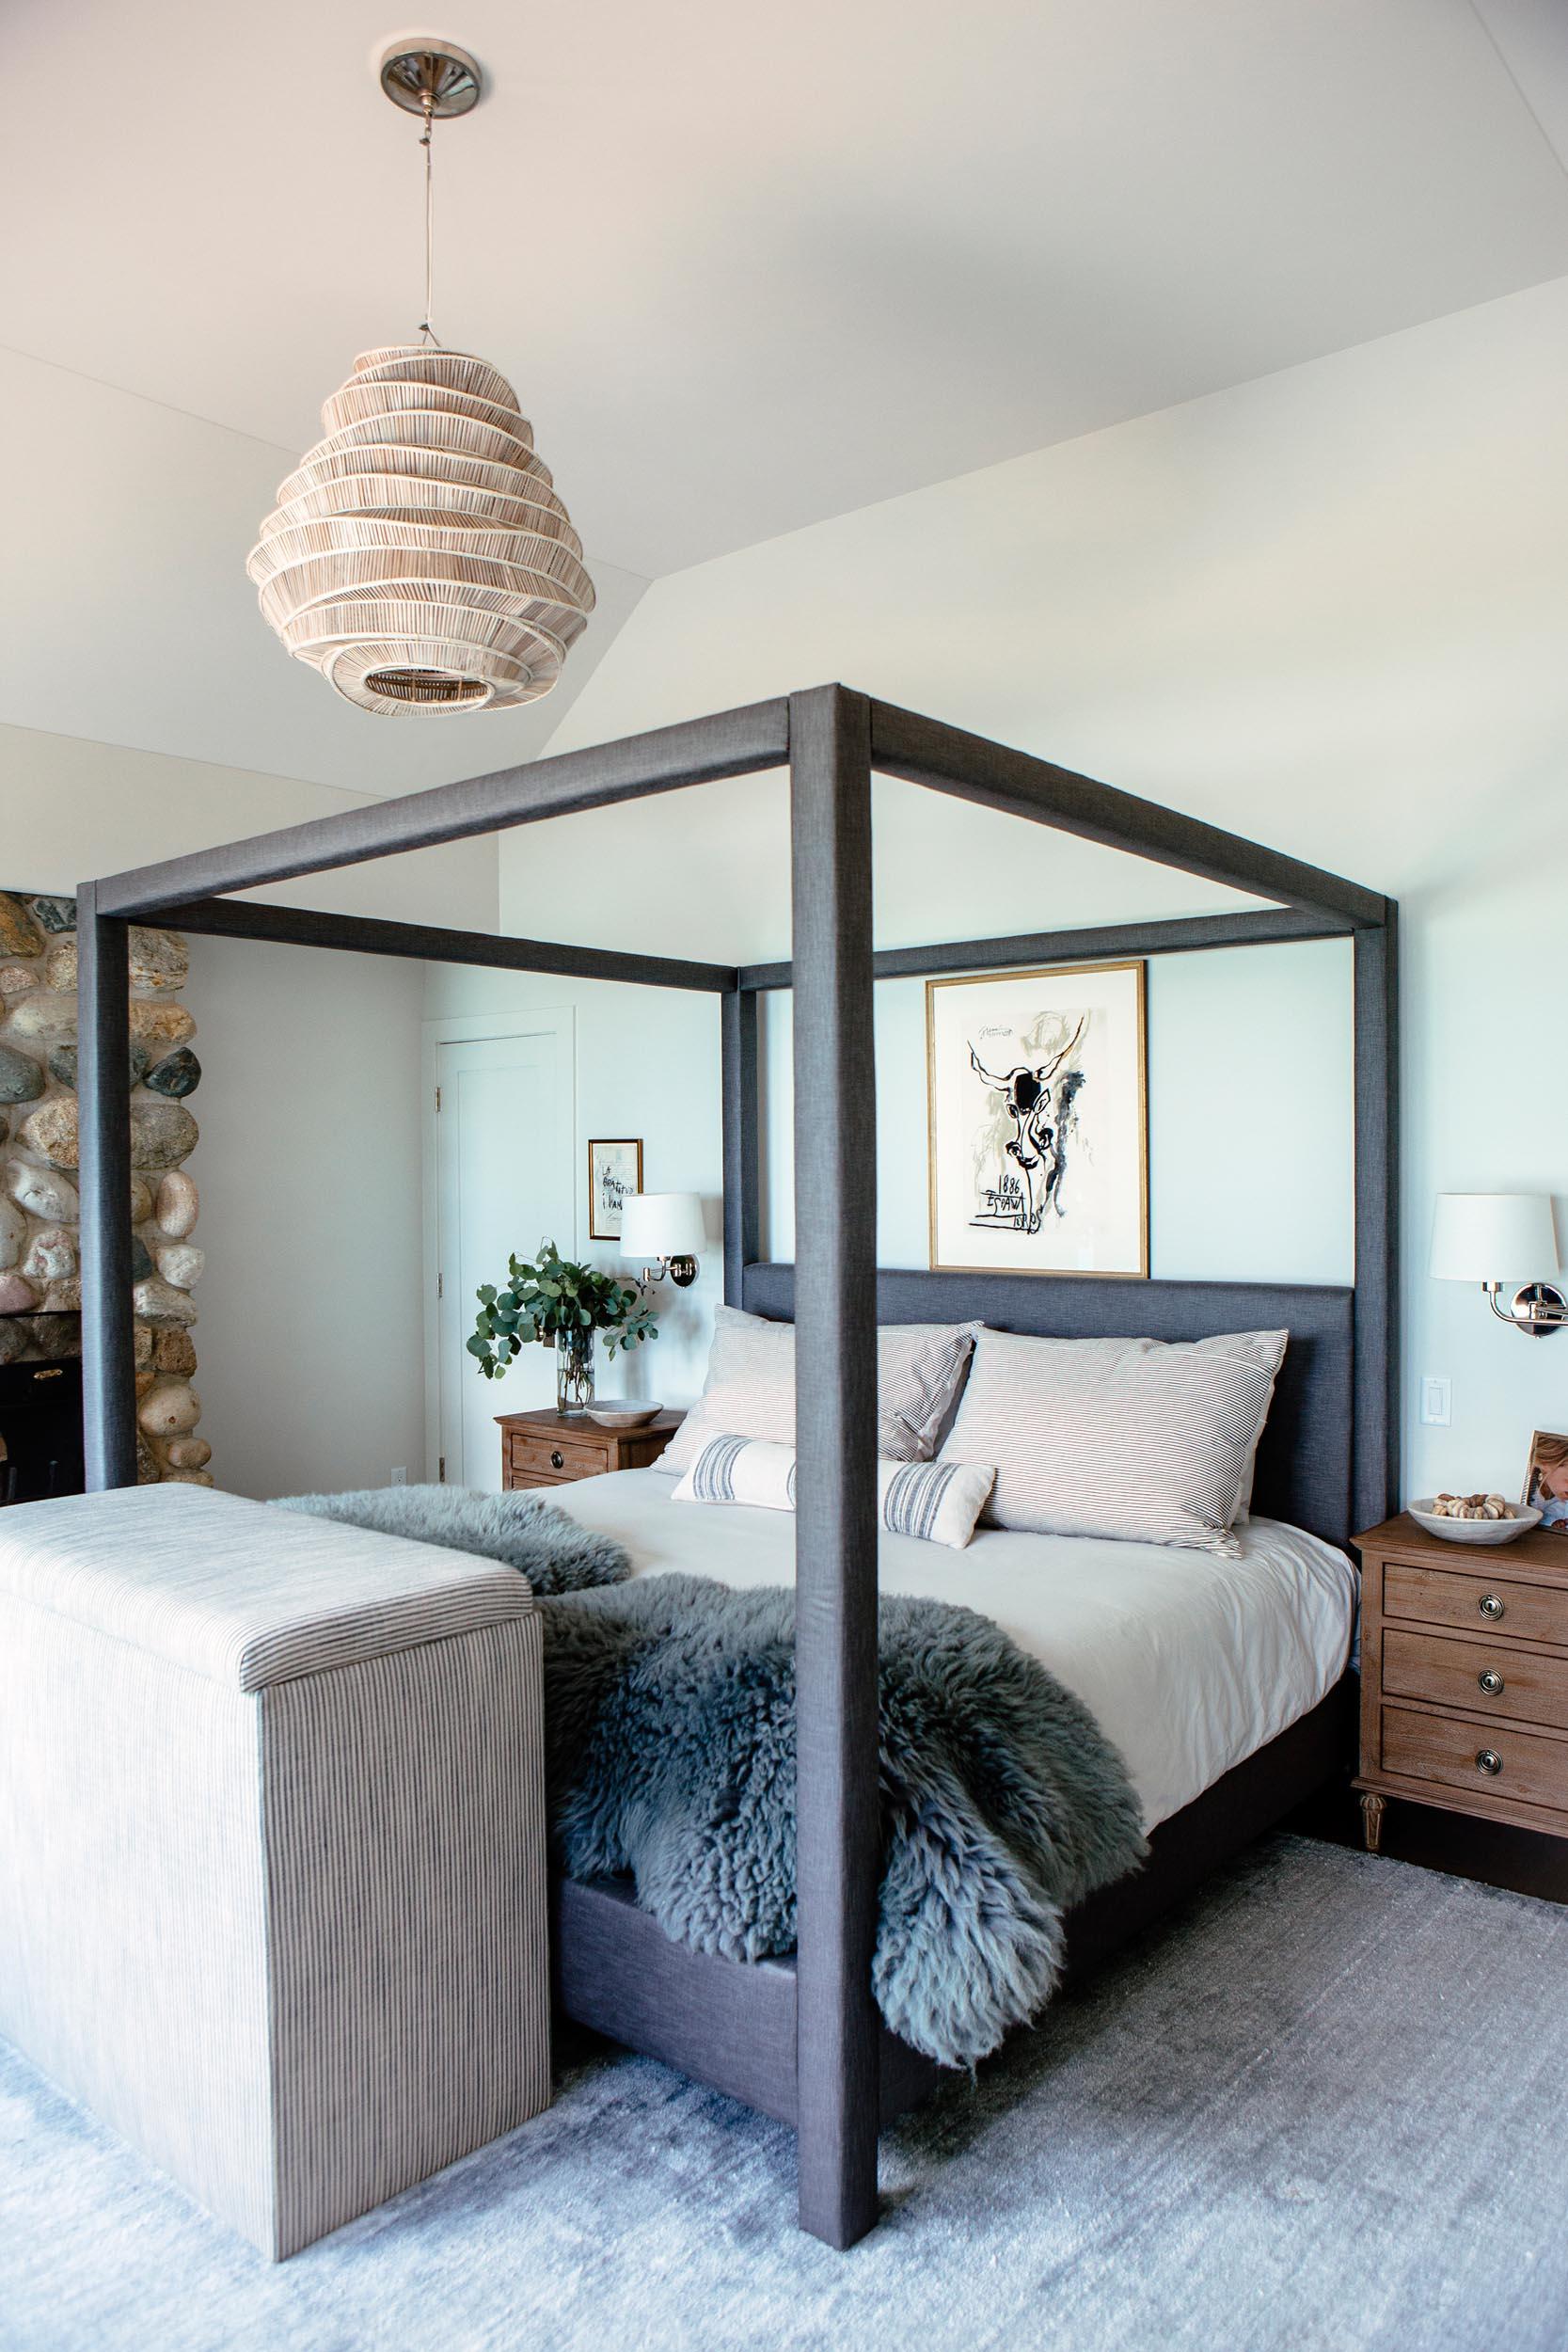 Leo_Designs_Chicago_interior_design_indigo_dreams_beach_house9.jpg